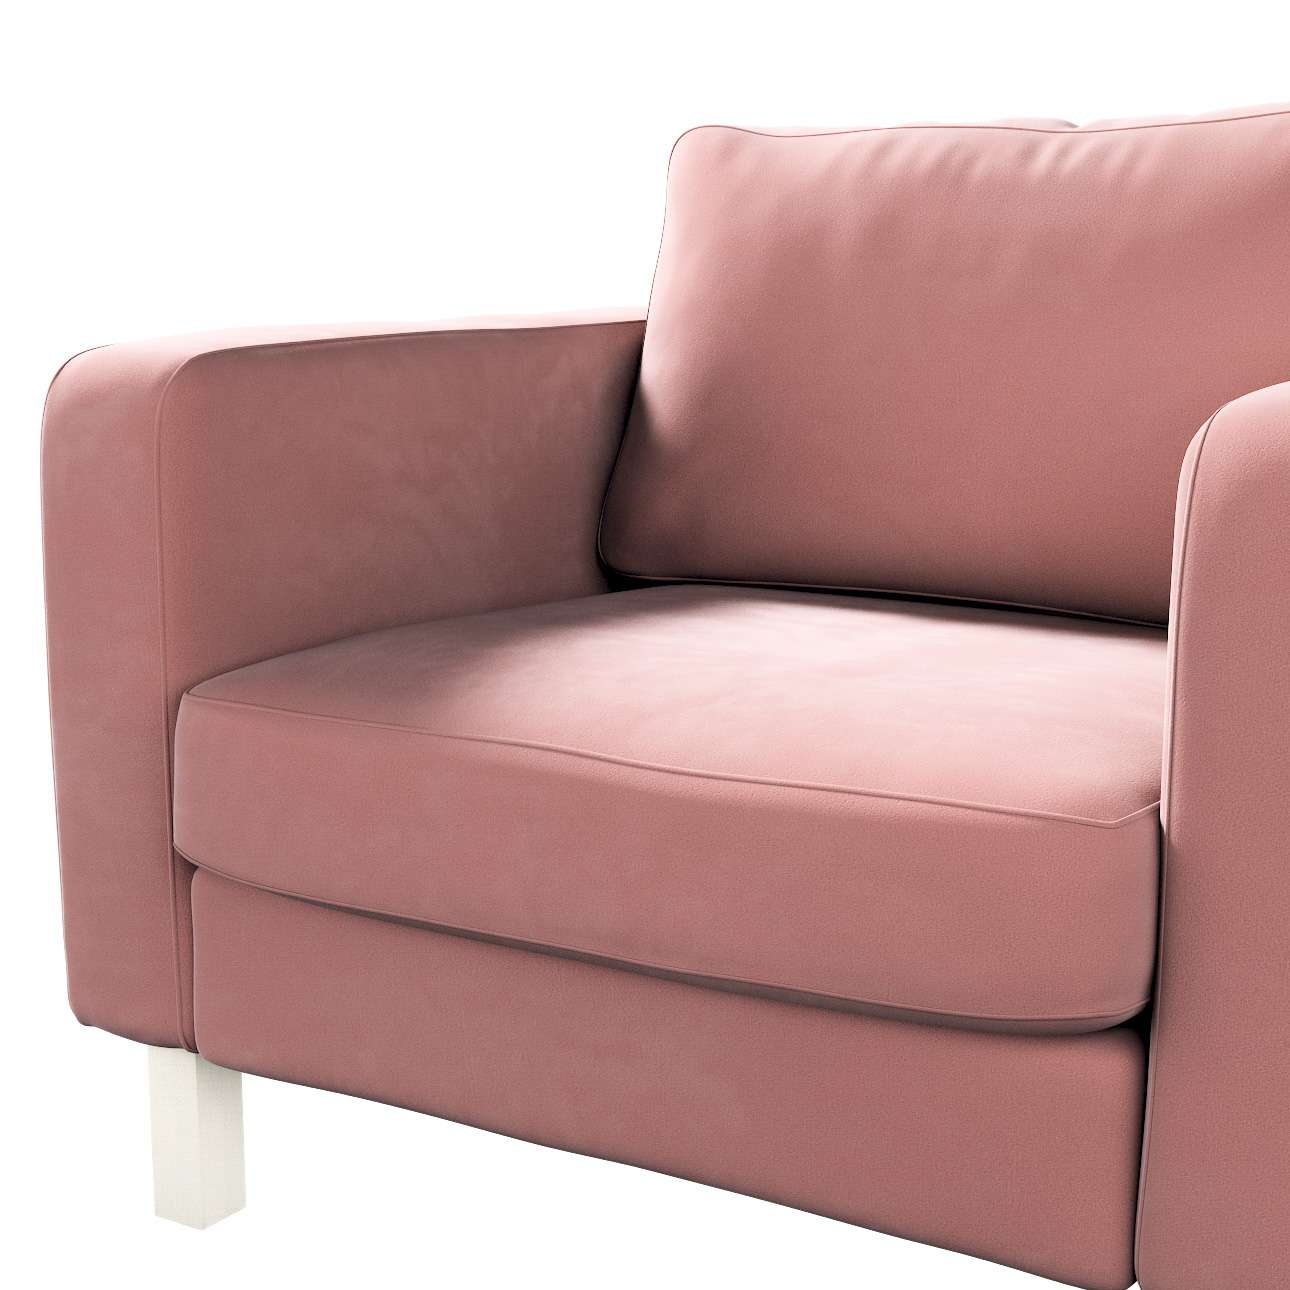 Pokrowiec na fotel Karlstad, krótki w kolekcji Velvet, tkanina: 704-30